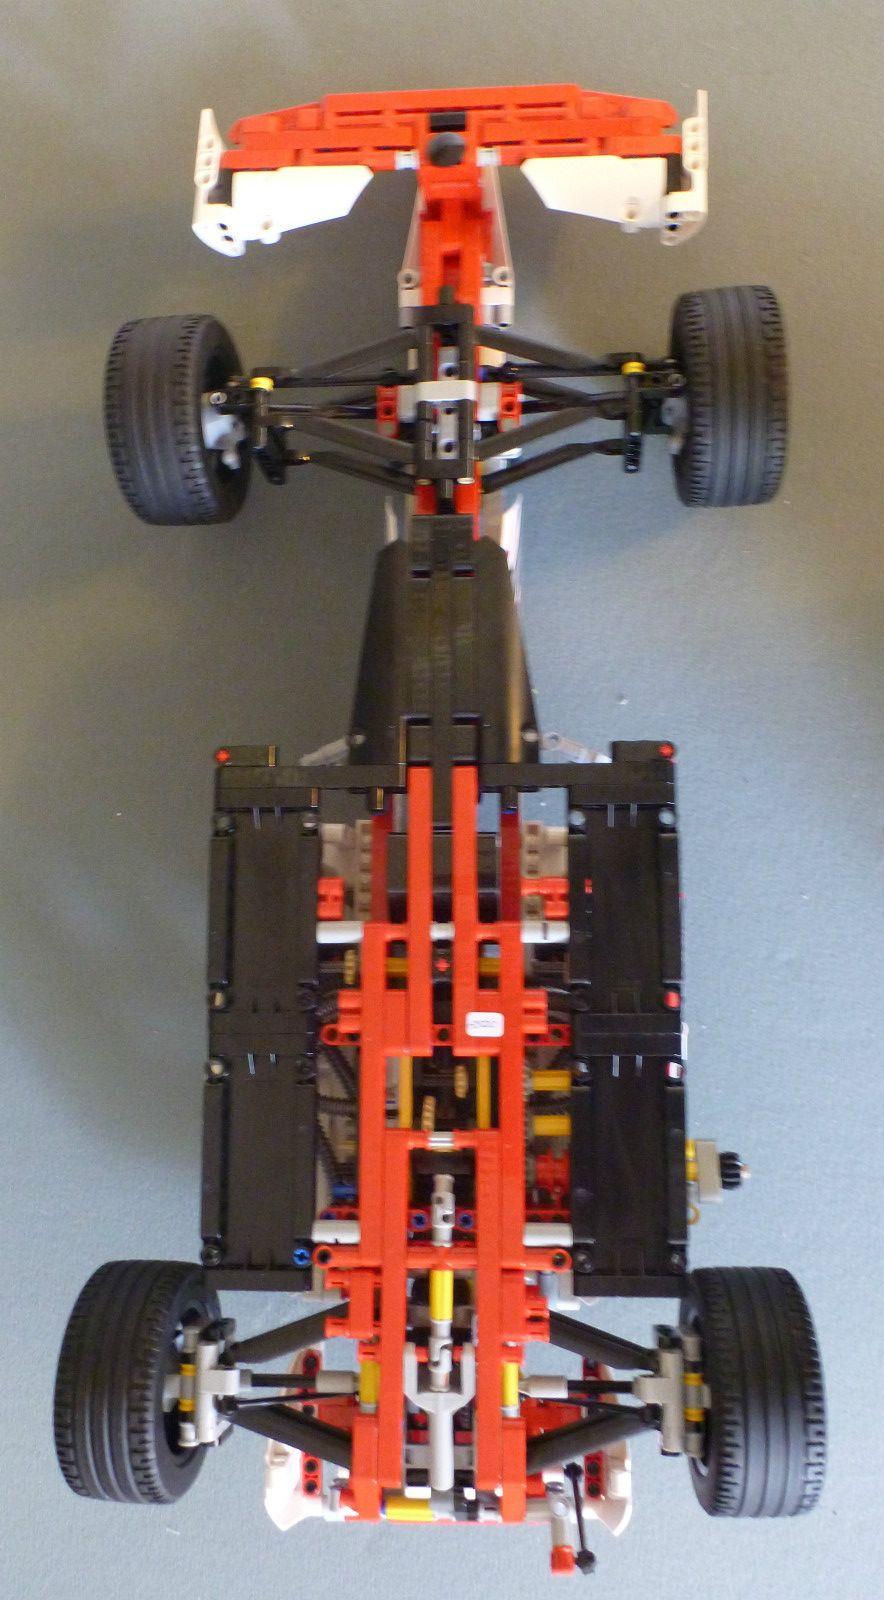 lego 42000 grand prix racer - photo #19